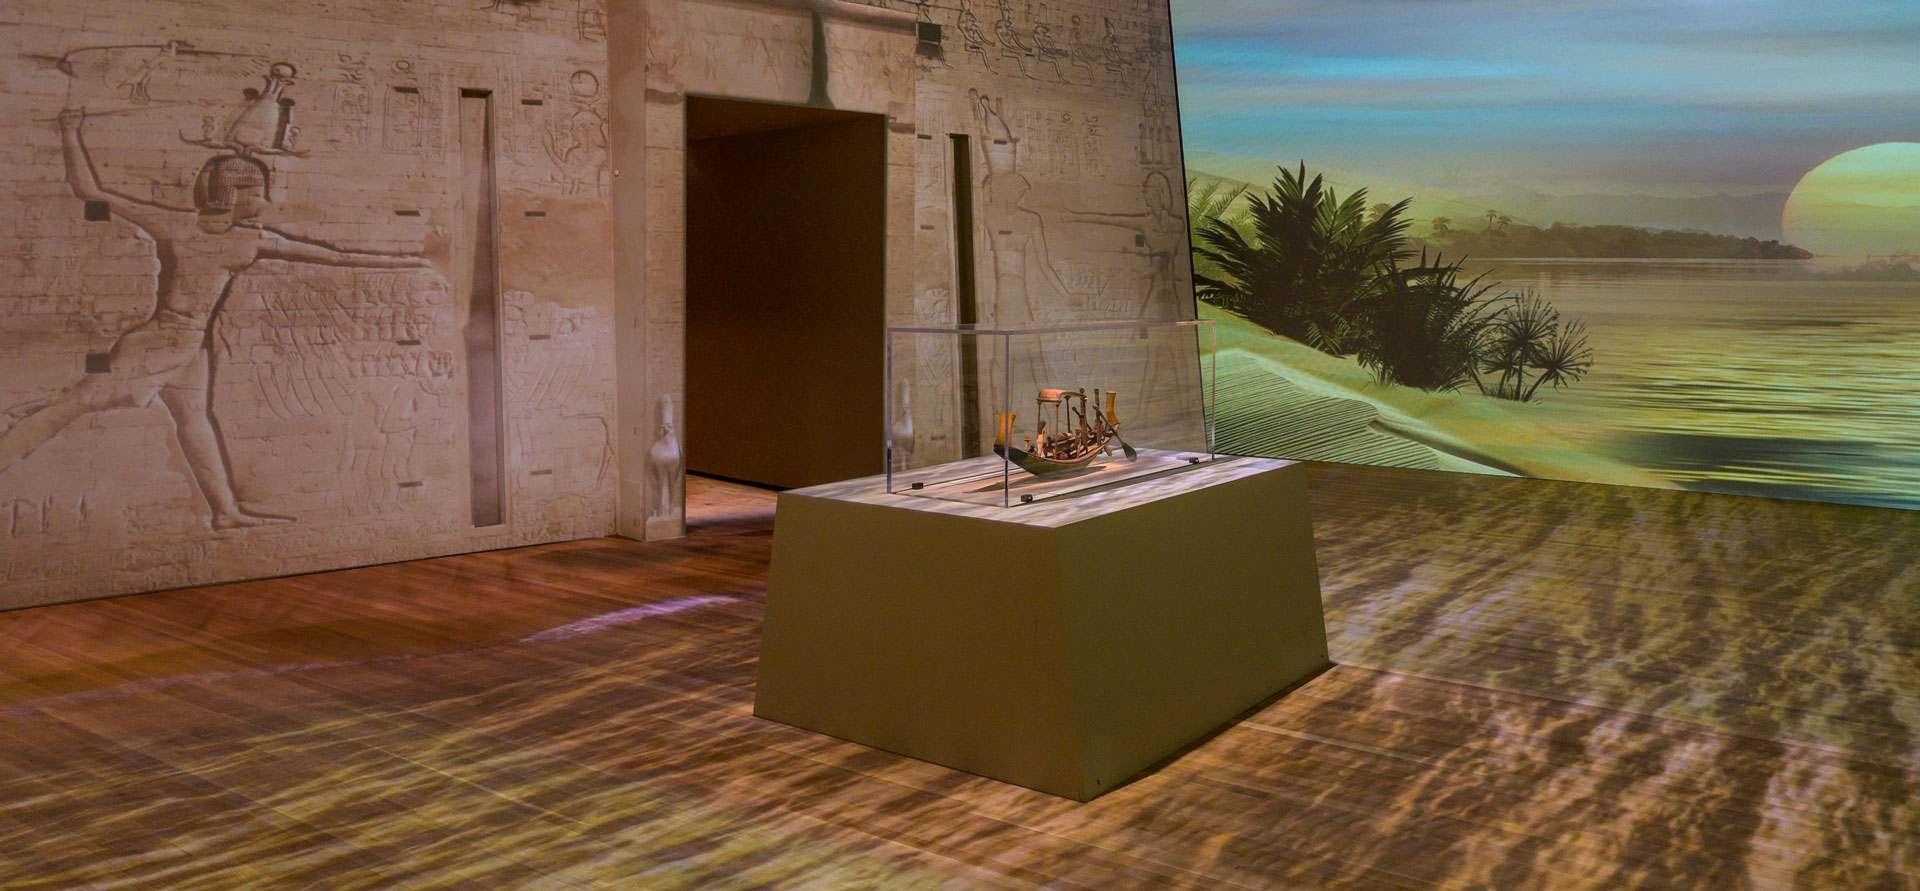 scene from the MMFA's exhibition Egyptian Mummies: Exploring Ancient Lives Photo MMFA, Denis Farley.